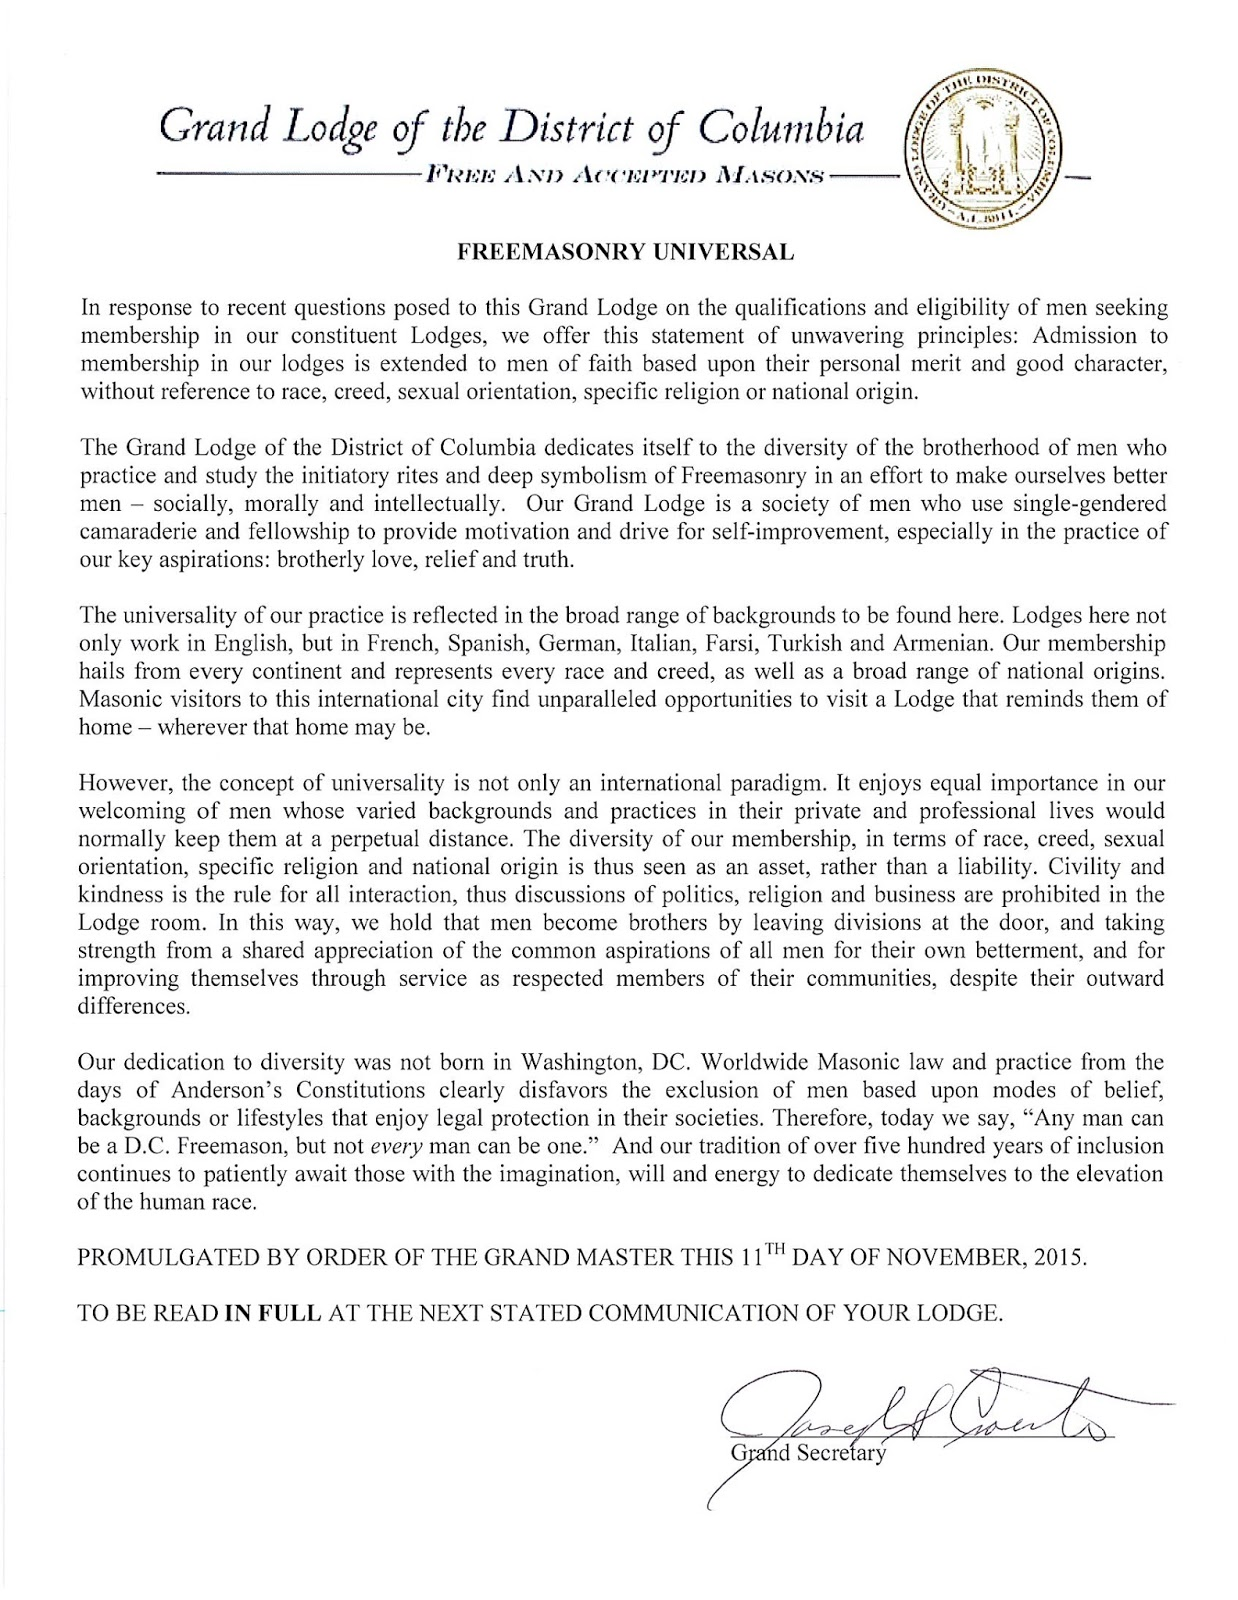 Freemasons for dummies glofdc issues statement concerning glofdc issues statement concerning eligibility for masons altavistaventures Images